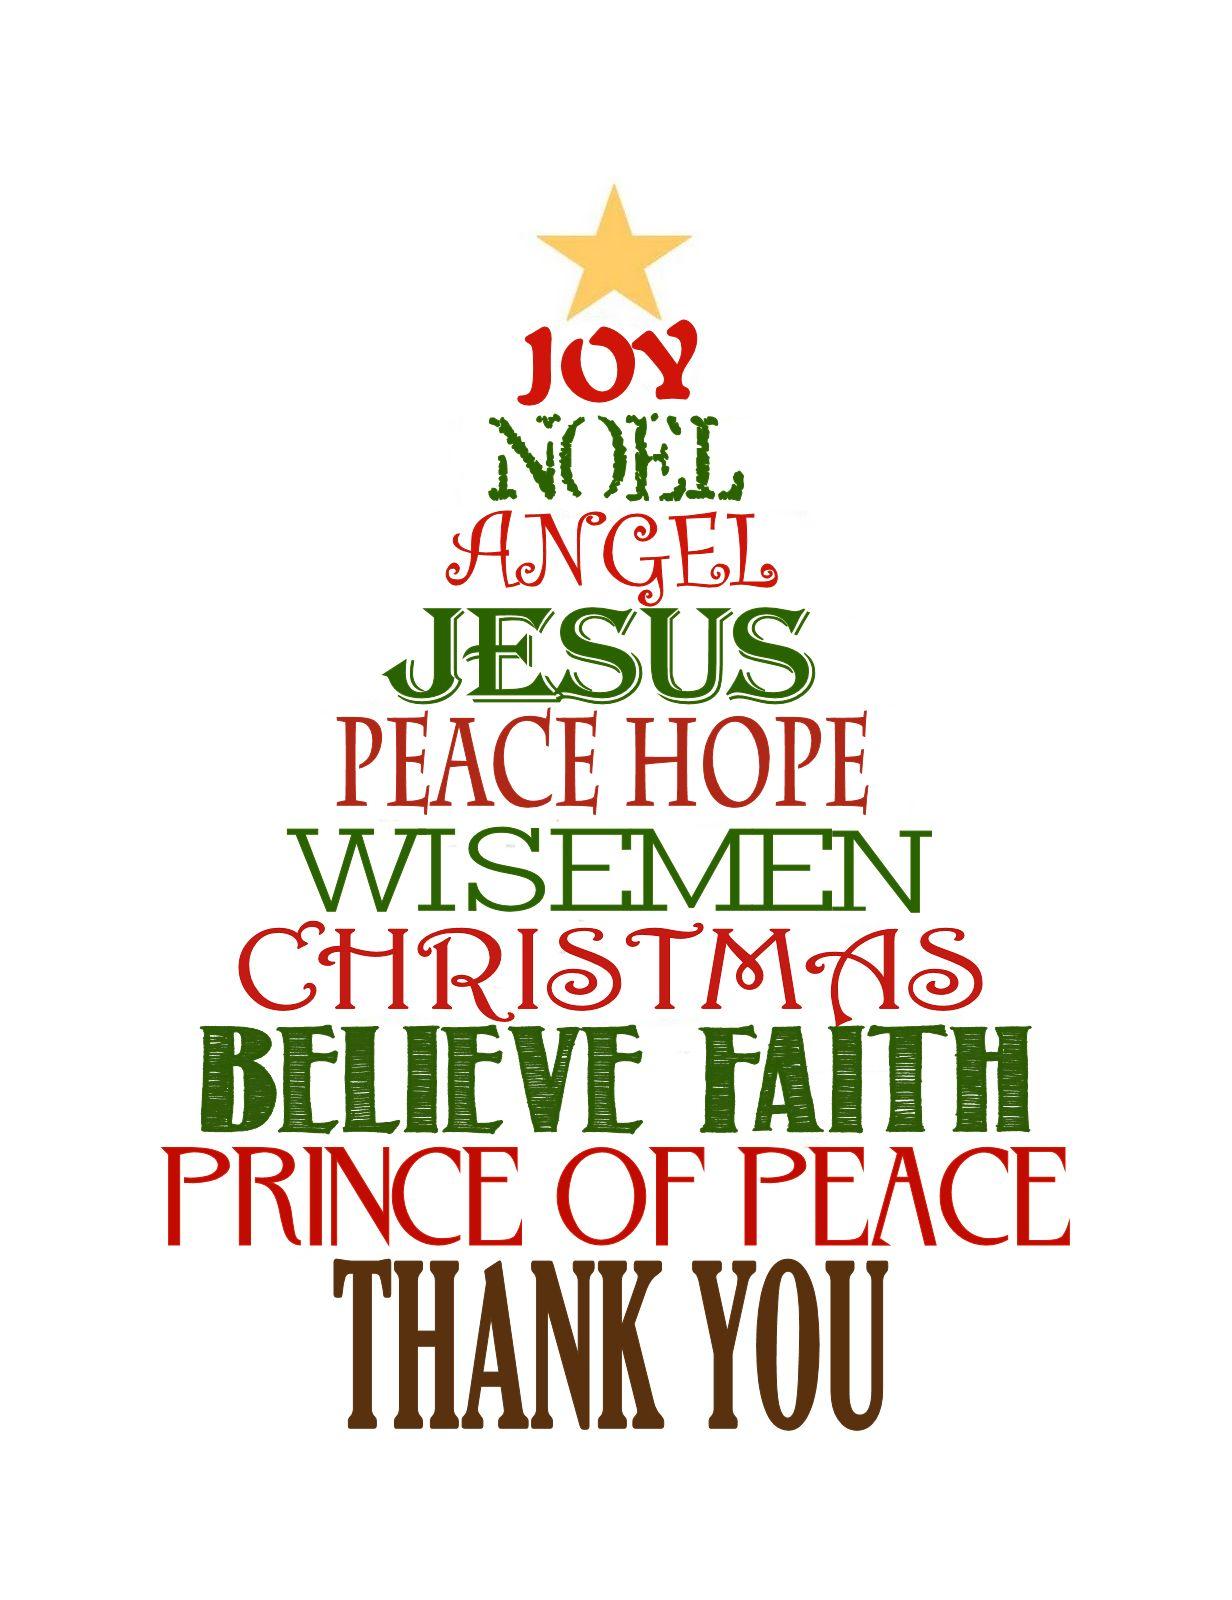 Religious Christmas Gifts.Eastern Christian Elementary School Pto Christmas Gift For